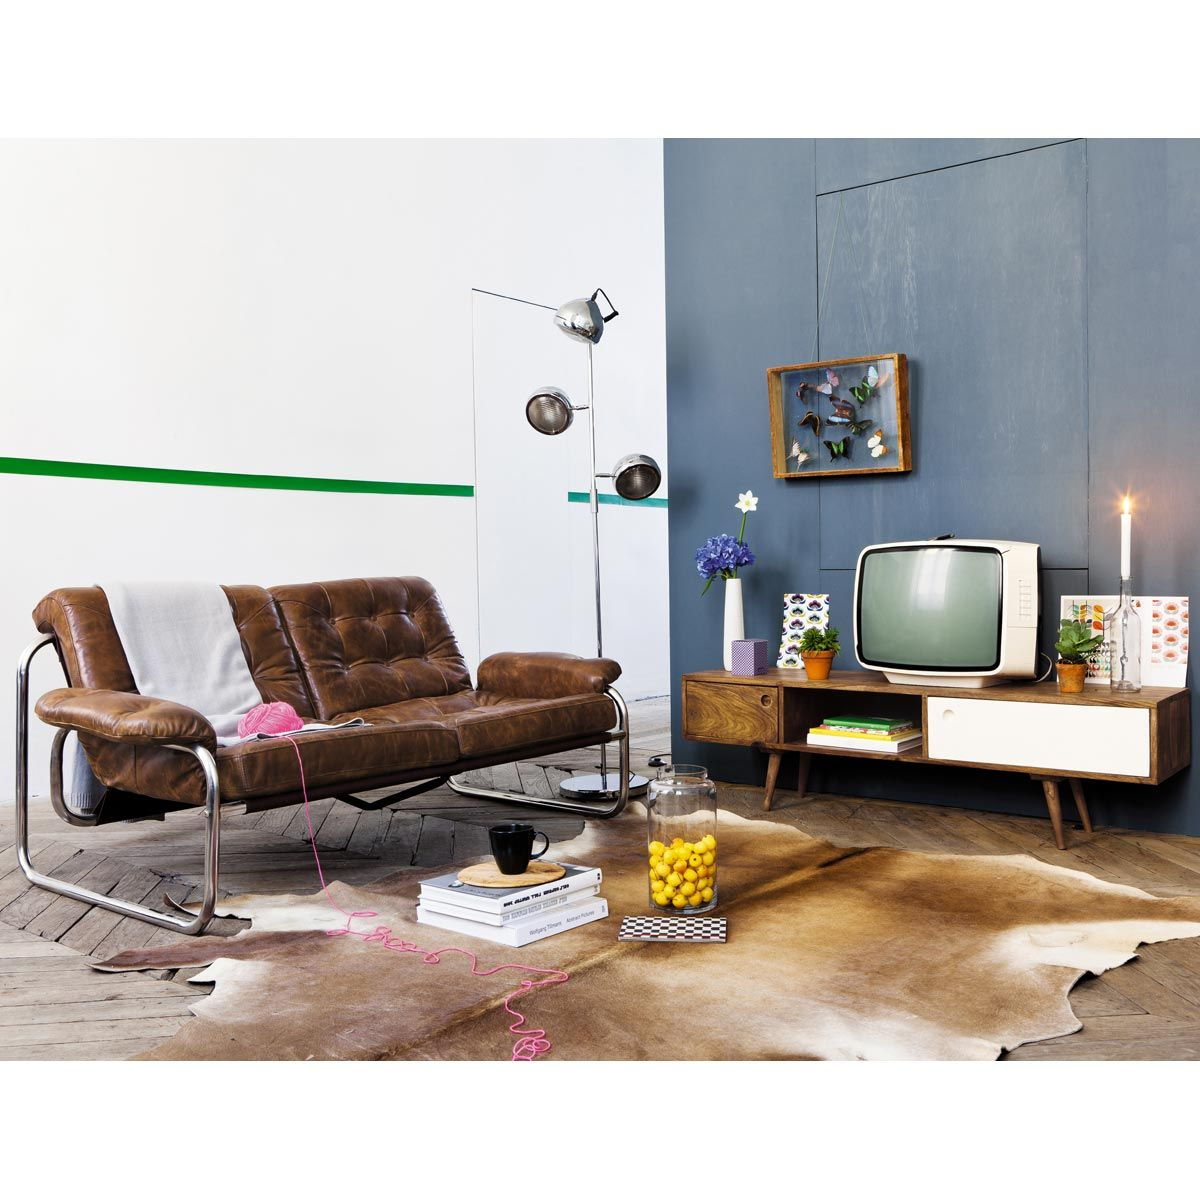 Mueble De Tv Vintage De Madera De Palo Rosa An 140 Cm Mueble Tv  # Muebles Leticia Elche